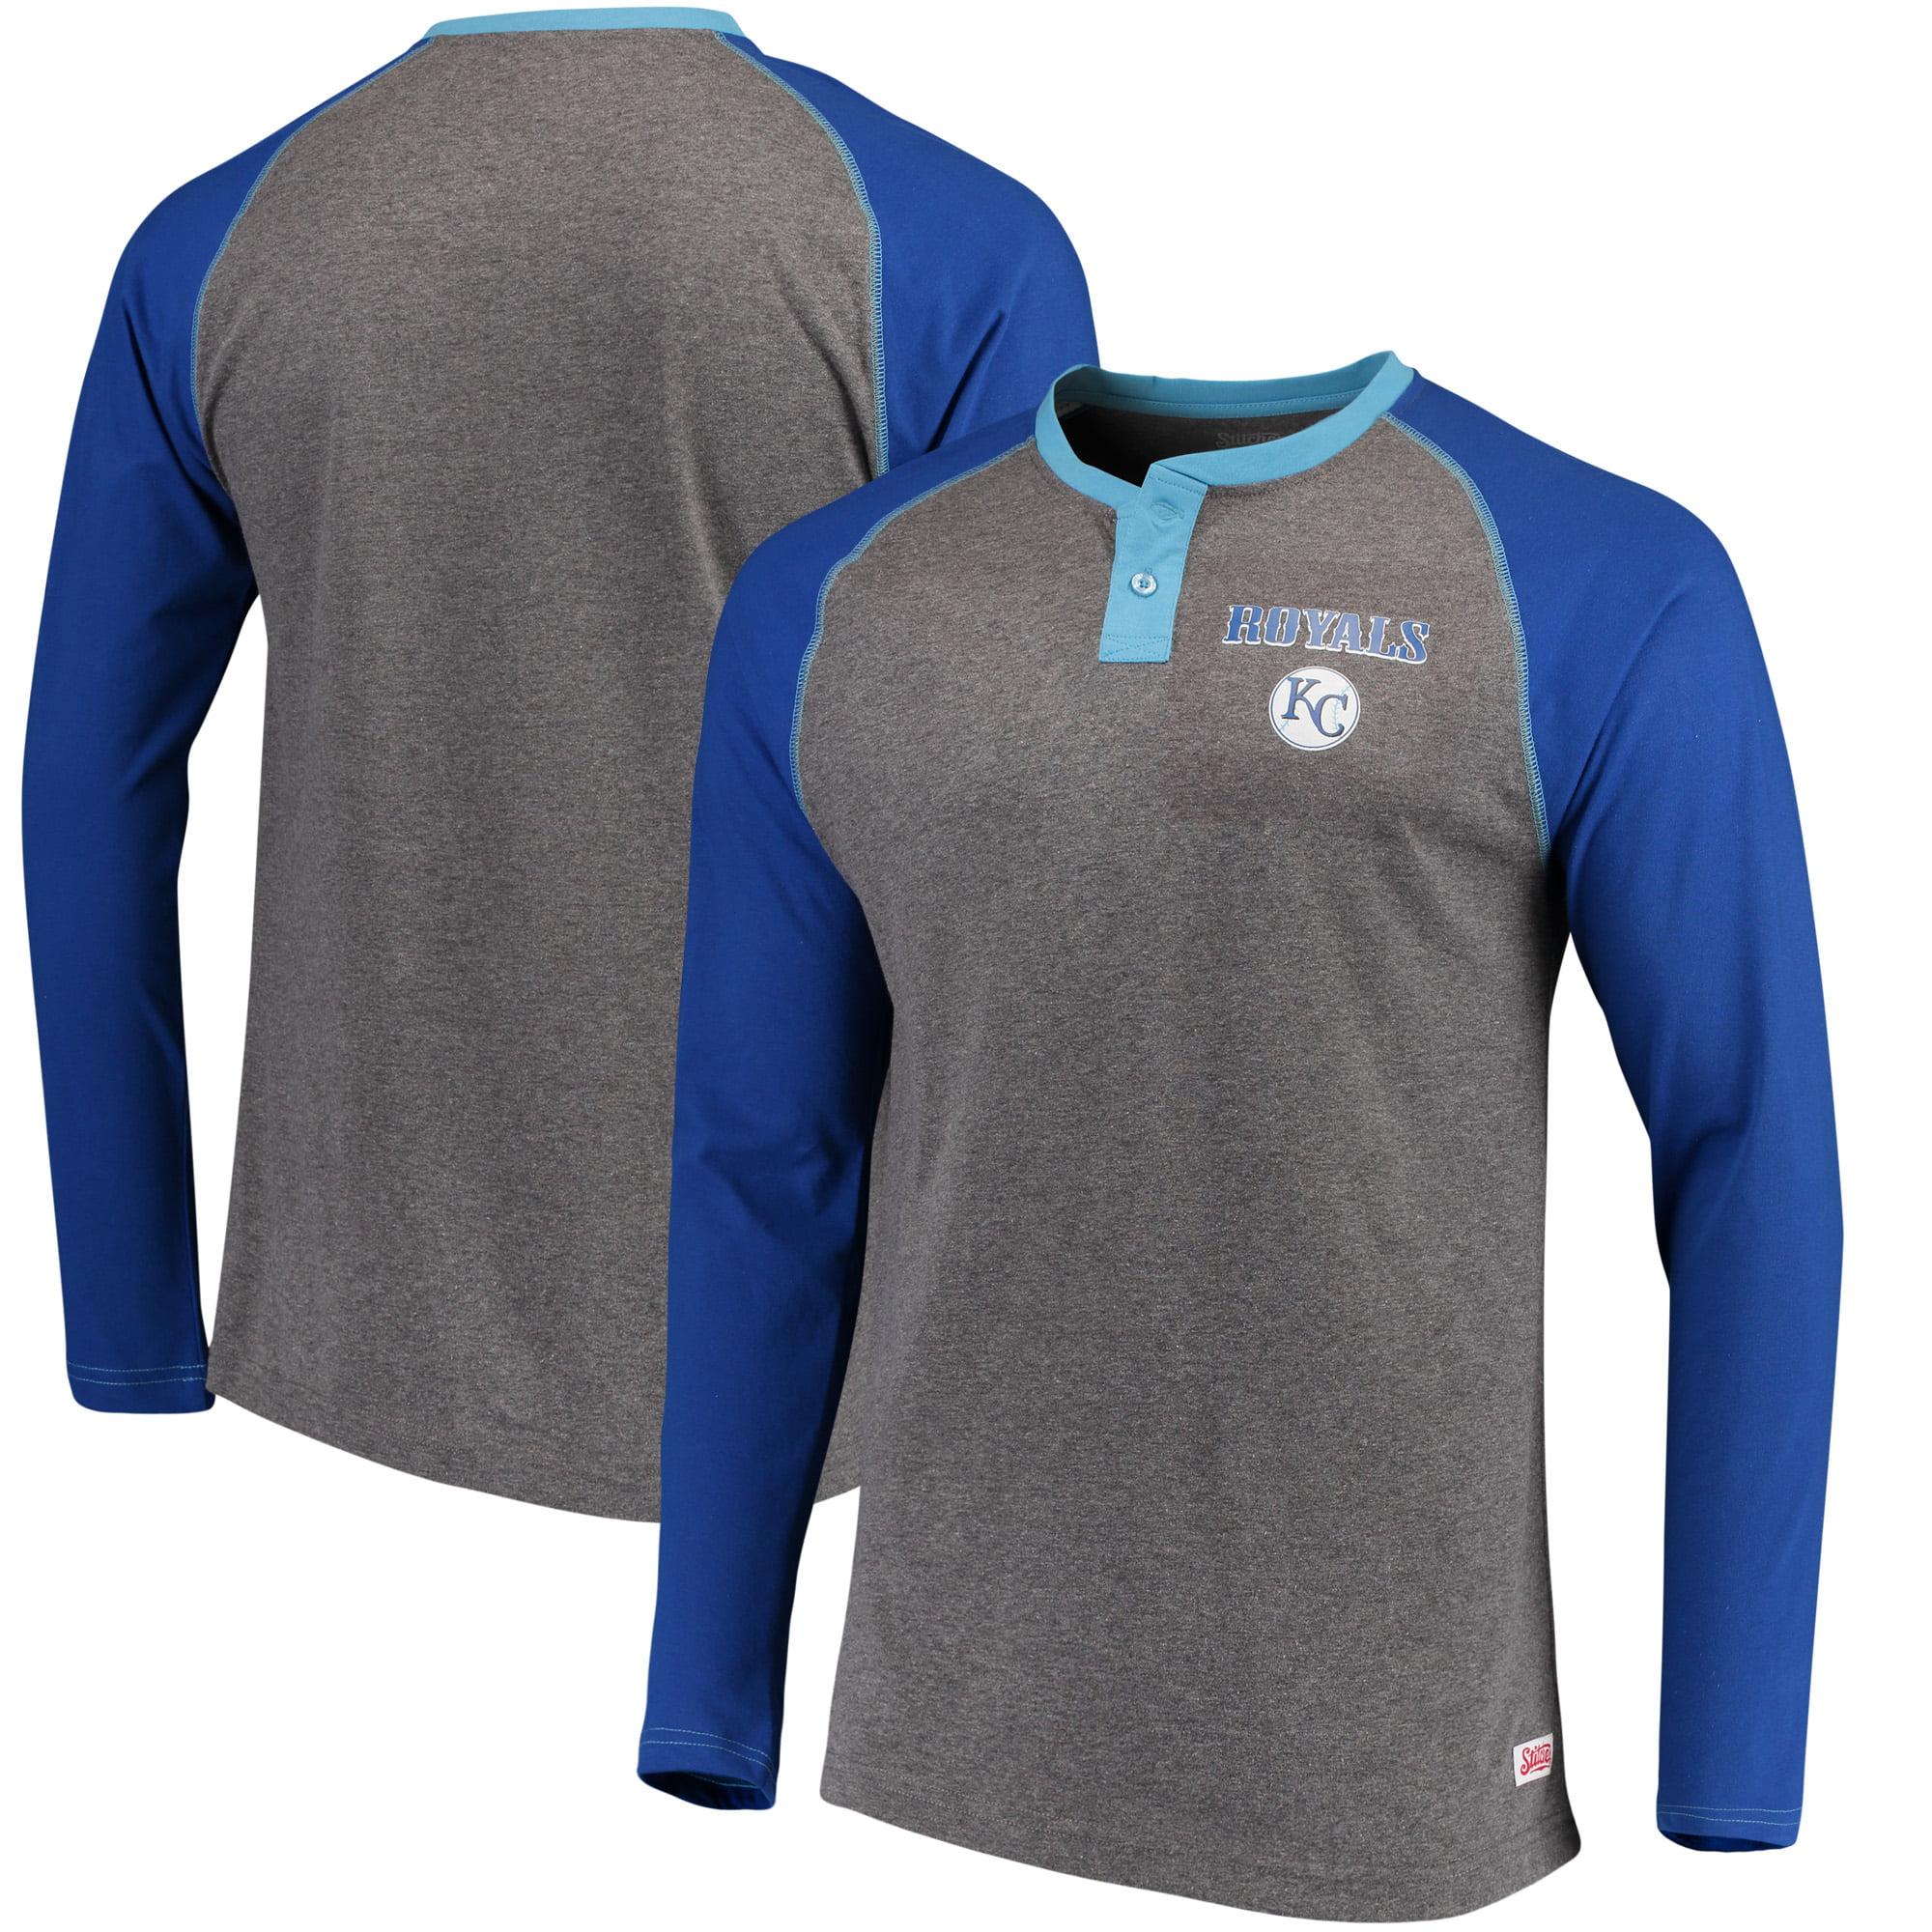 Kansas City Royals Stitches Home Run Long Sleeve Henley T-Shirt - Heathered Gray/Royal